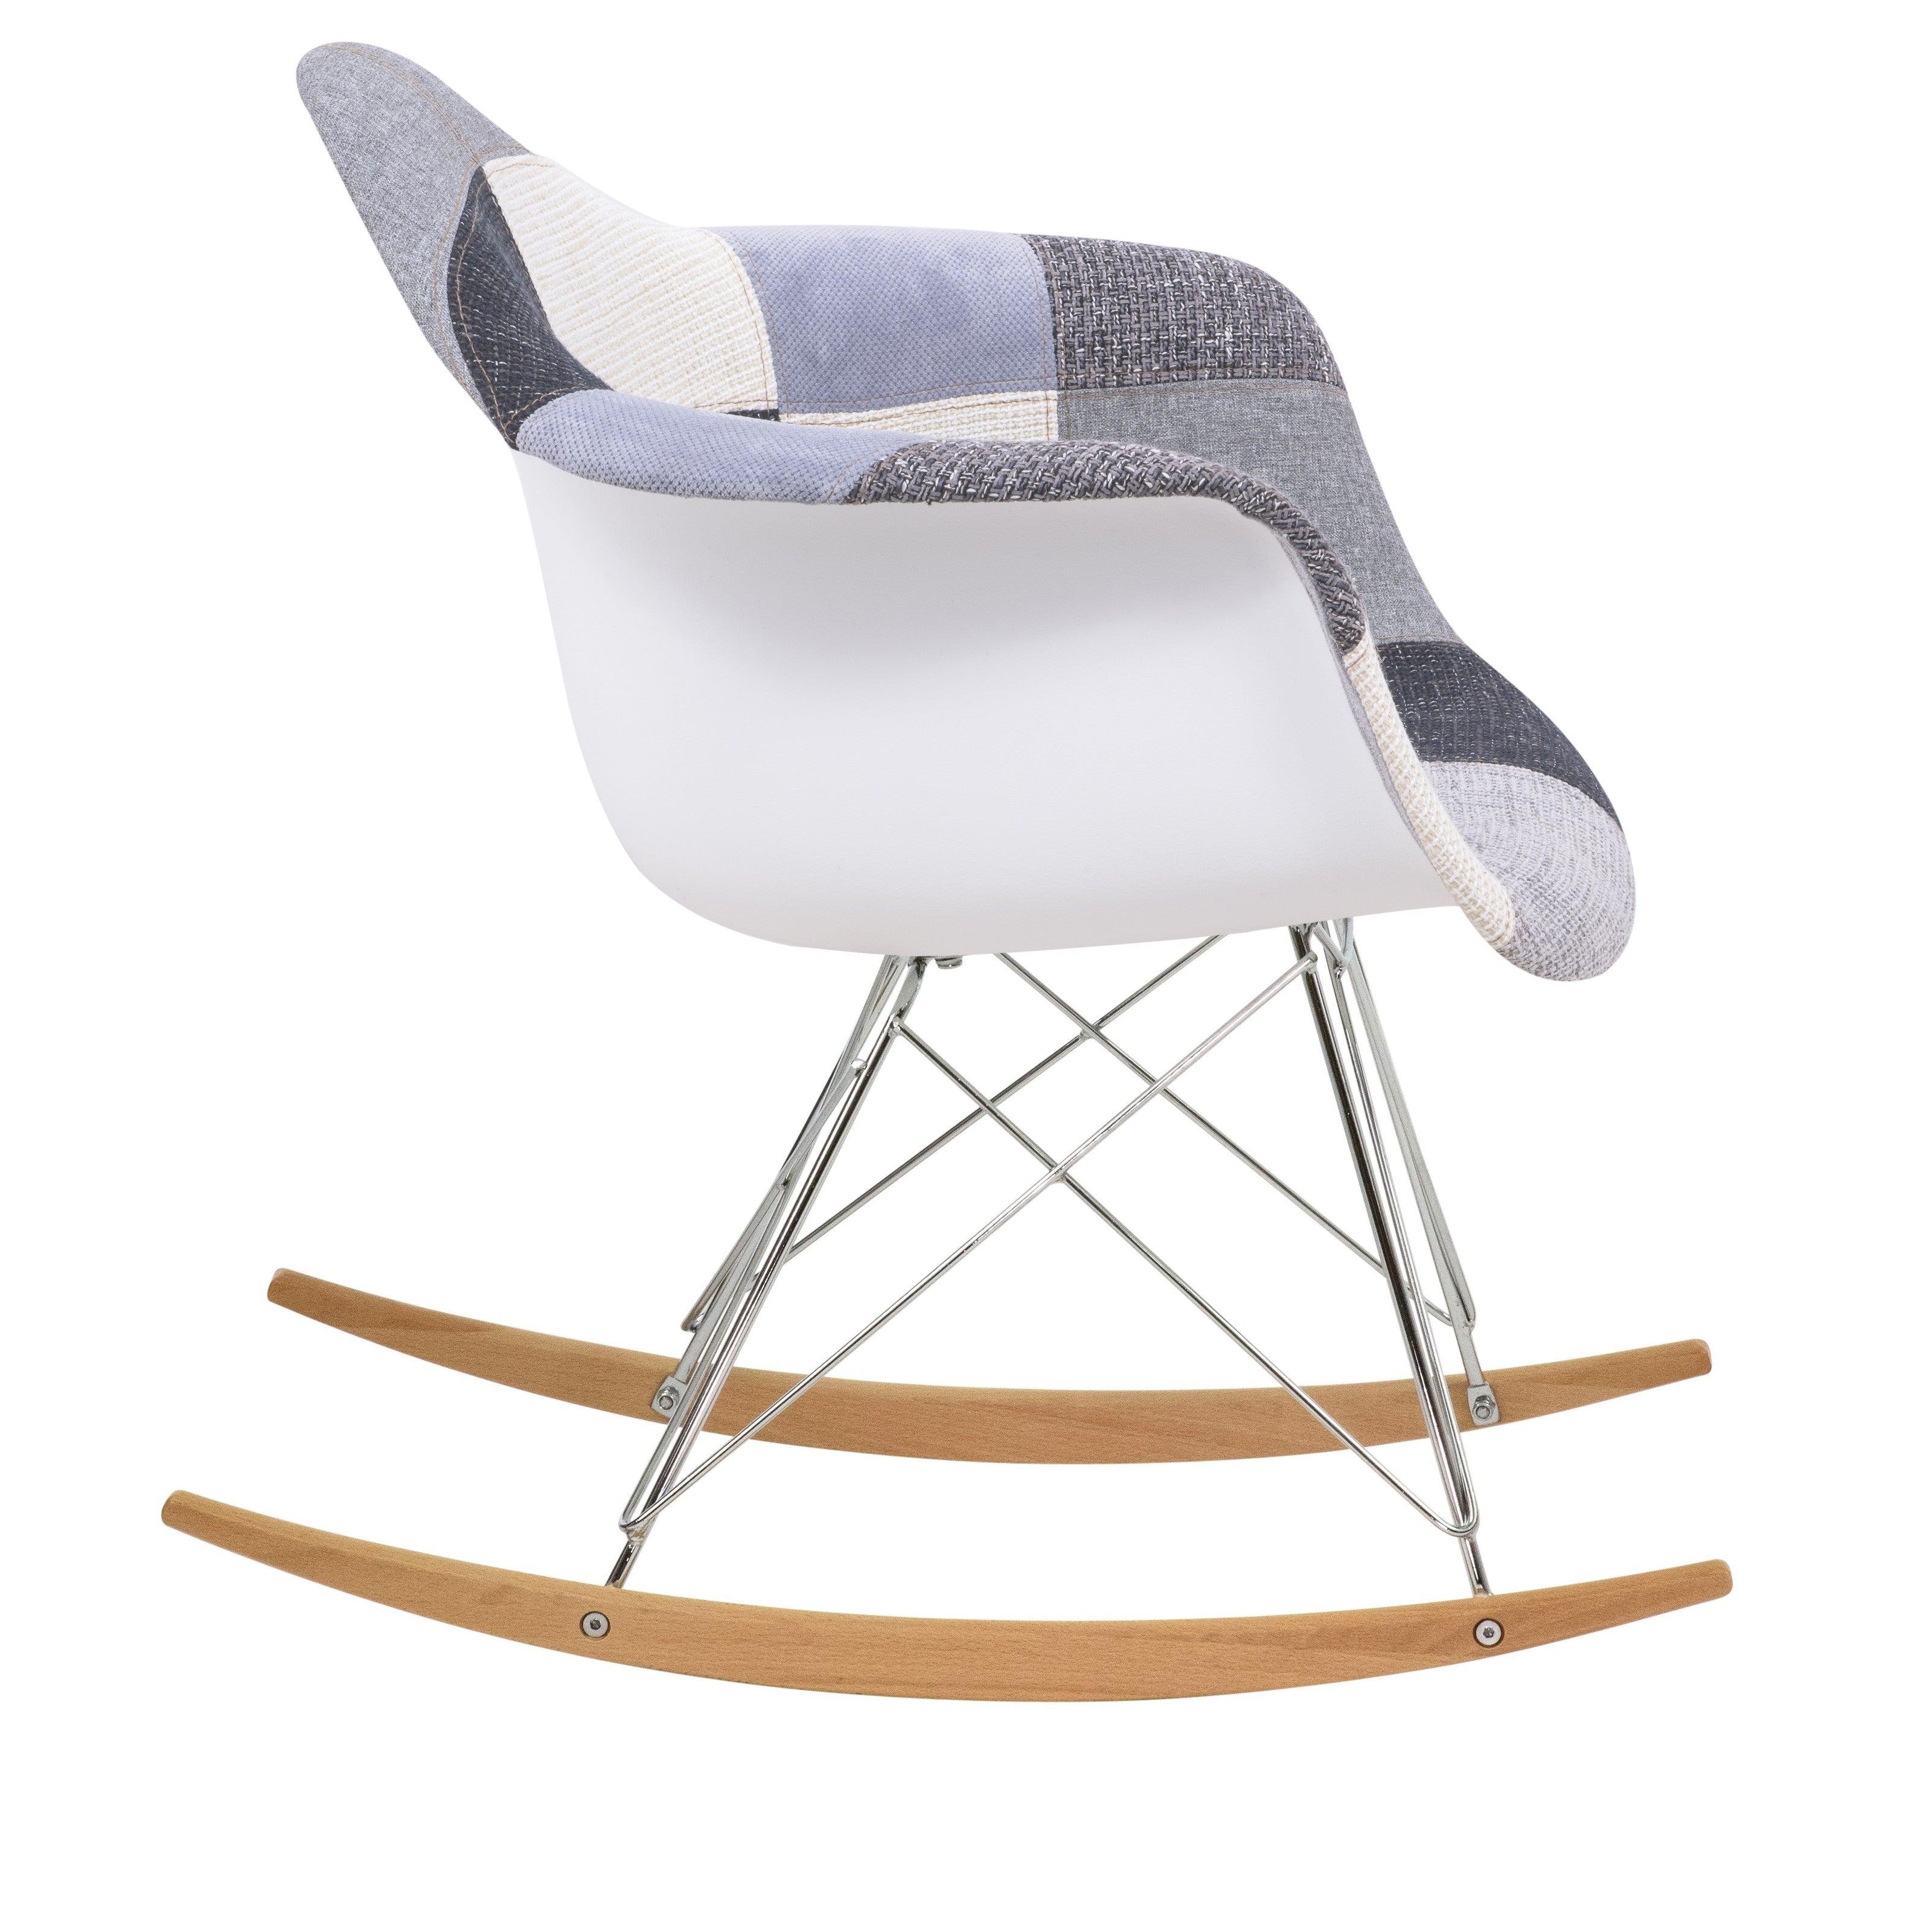 Leisuremod Wilson Twill Fabric Multi Rocking Chair W/ Eiffel Legs Inside Twill Fabric Multi Rocking Chairs With Eiffel Legs (View 7 of 20)